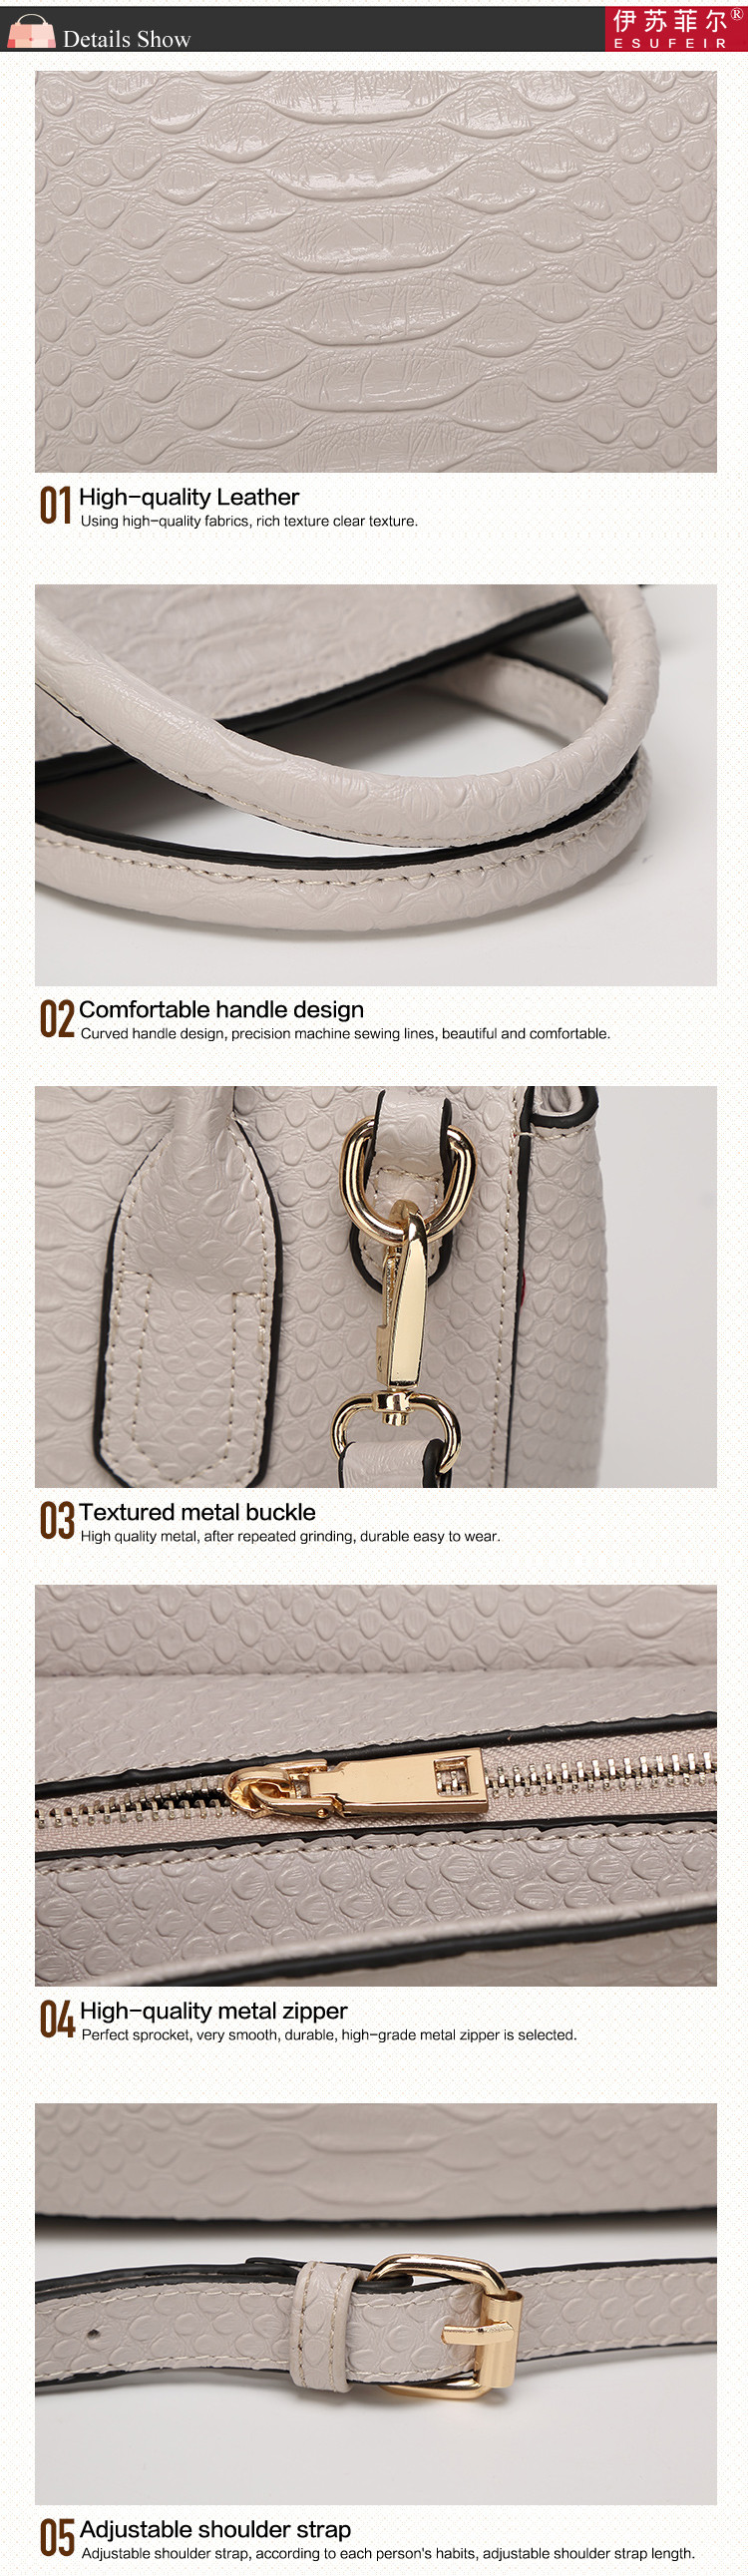 women-handbag03_01 (1)